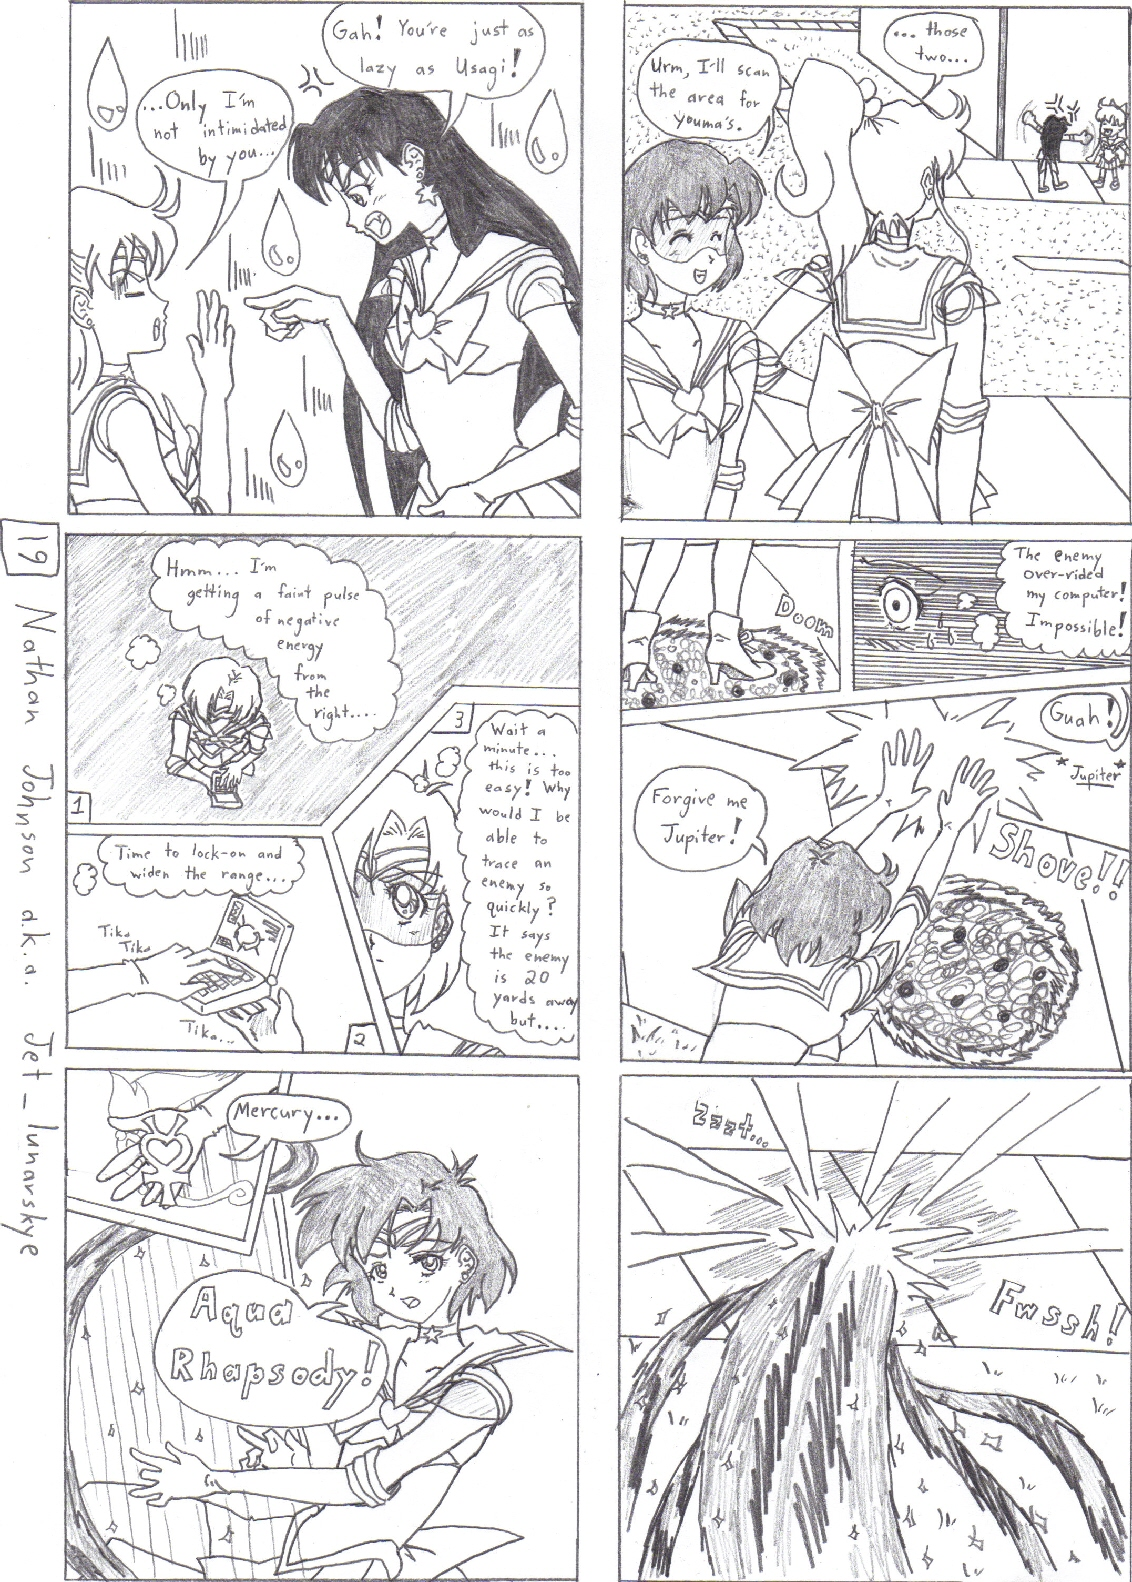 Sailor Moon Stars: Nightmare Soldier page 19 by Jet_lunarskye